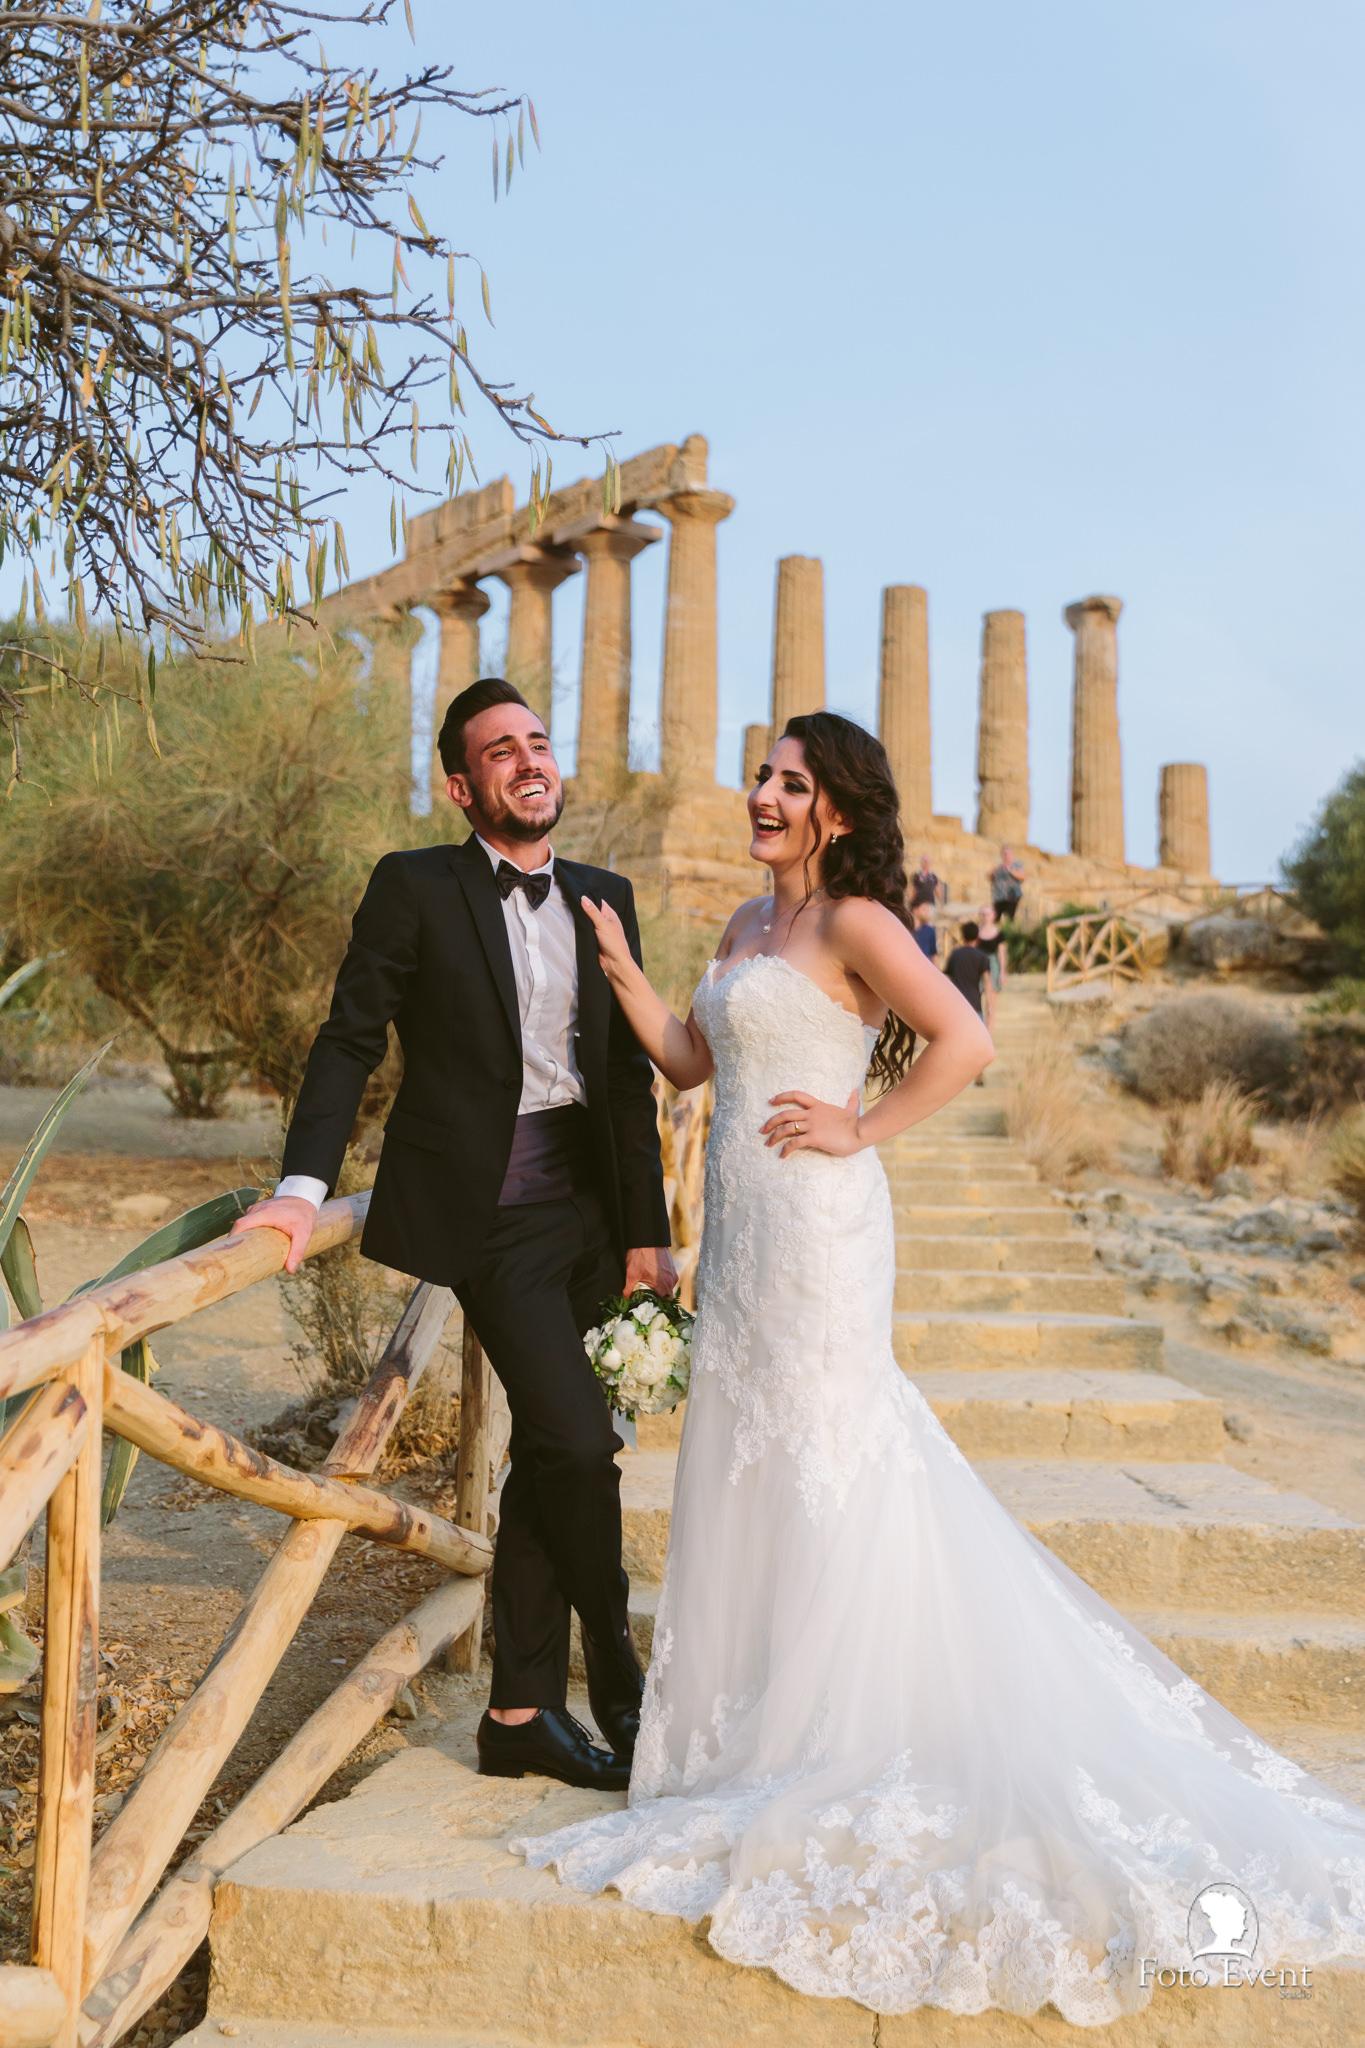 040-2019-08-31-Matrimonio-Serena-e-Saverio-Tarantino-5DE-1333